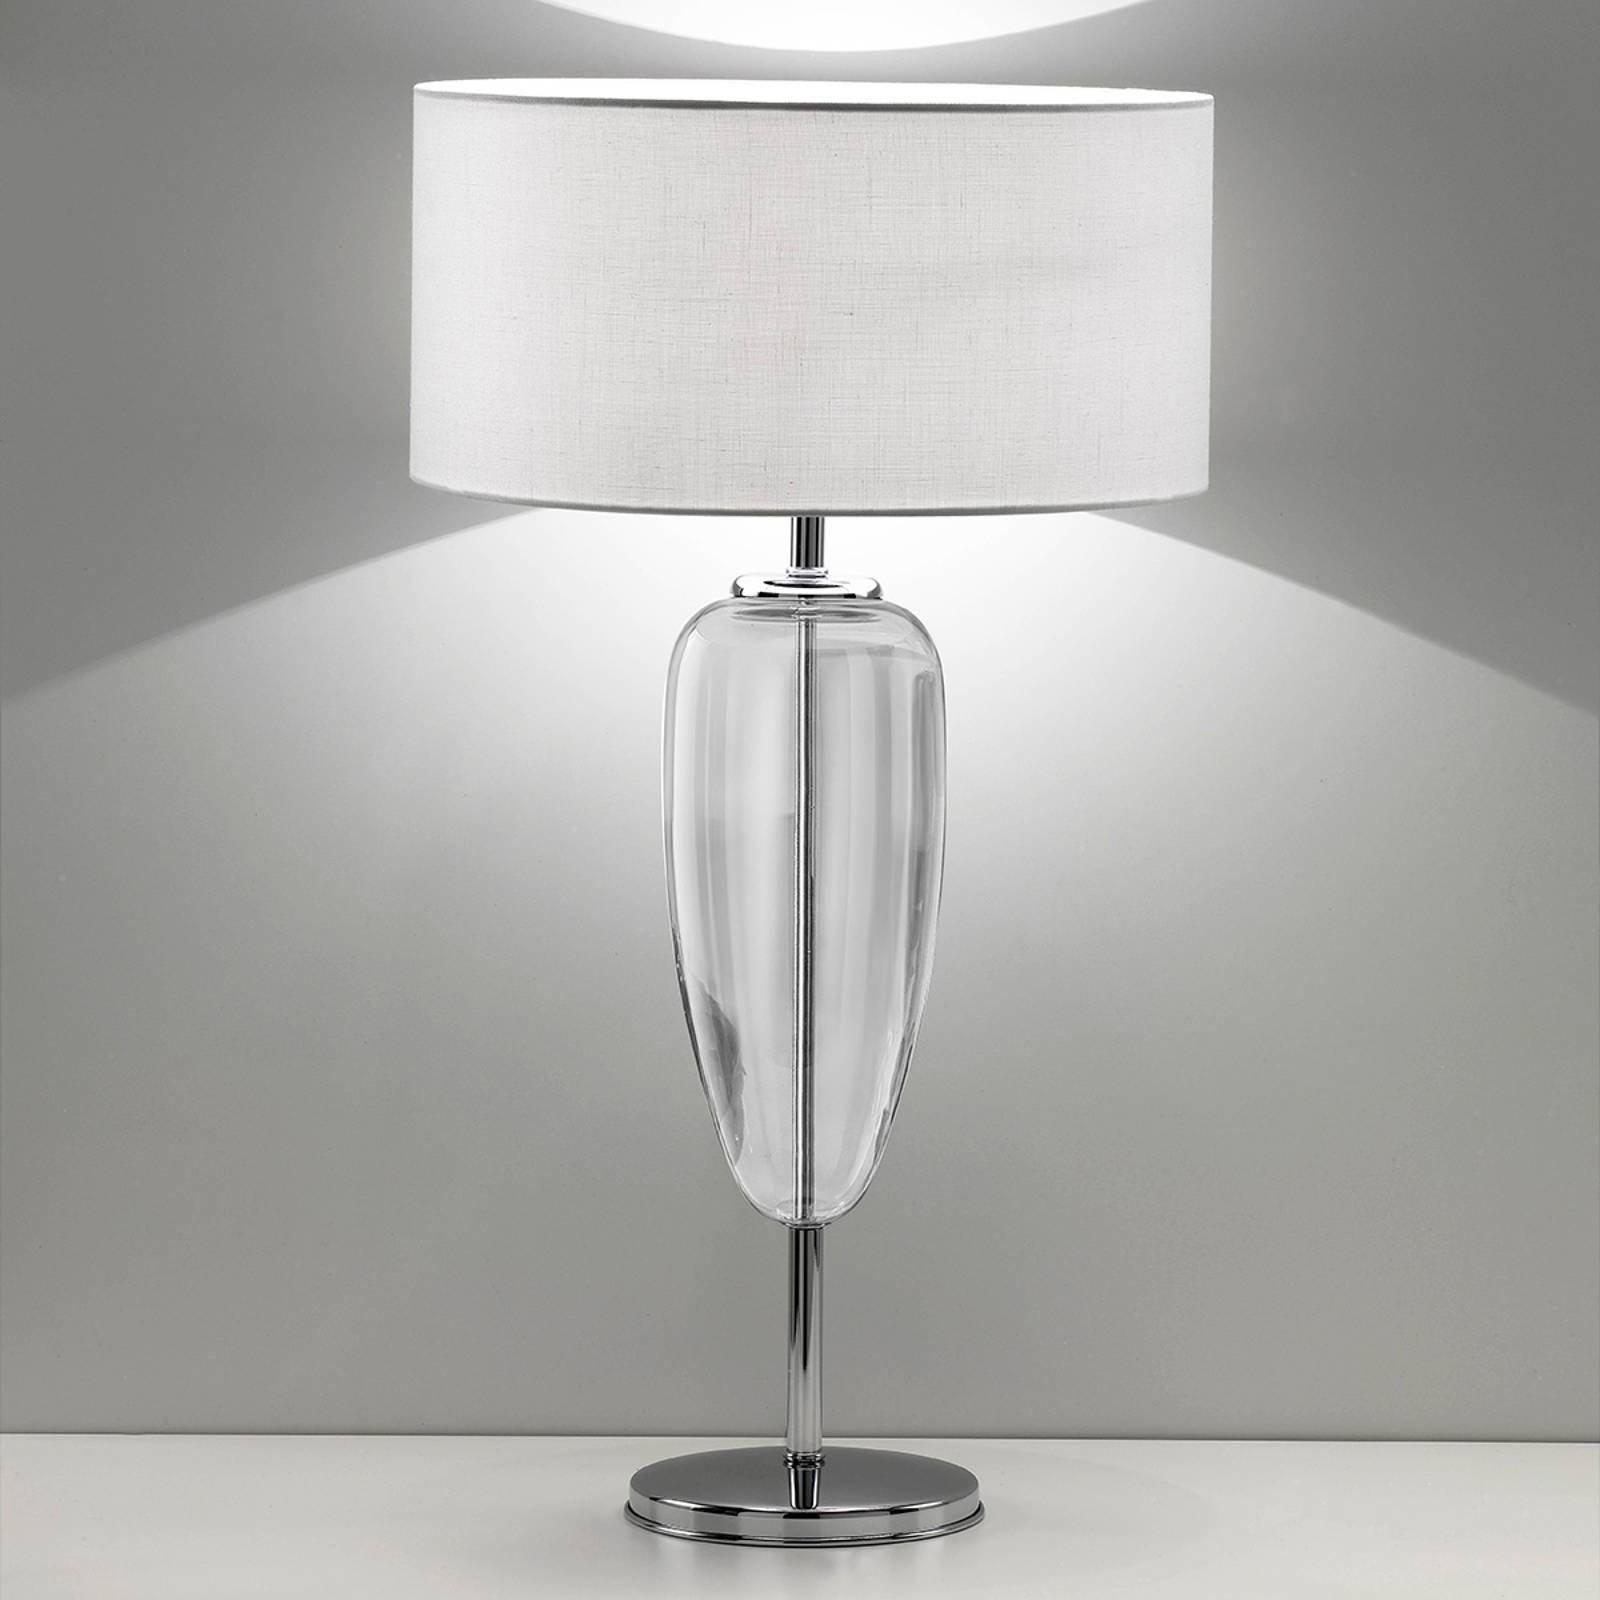 Bordlampe Show Ogiva 82 cm glasselement klar